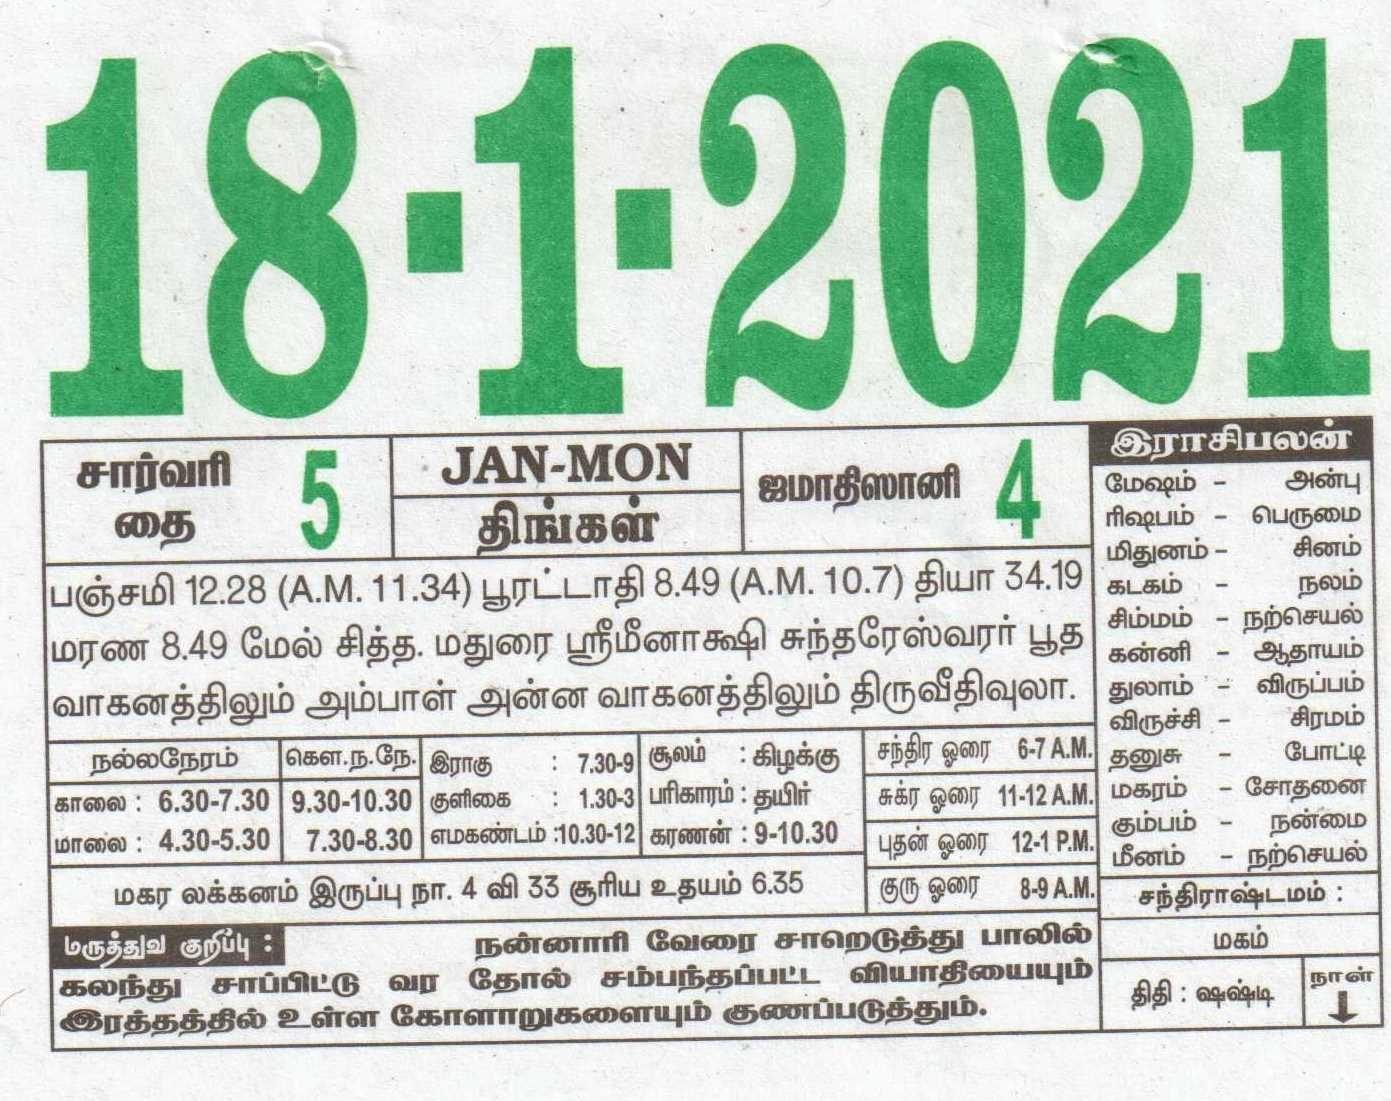 18-01-2021 Daily Calendar | Date 18 , January Daily Tear Off Calendar | Daily Panchangam Rasi Palan Marriage Dates In November 2021 Hindu Calendar